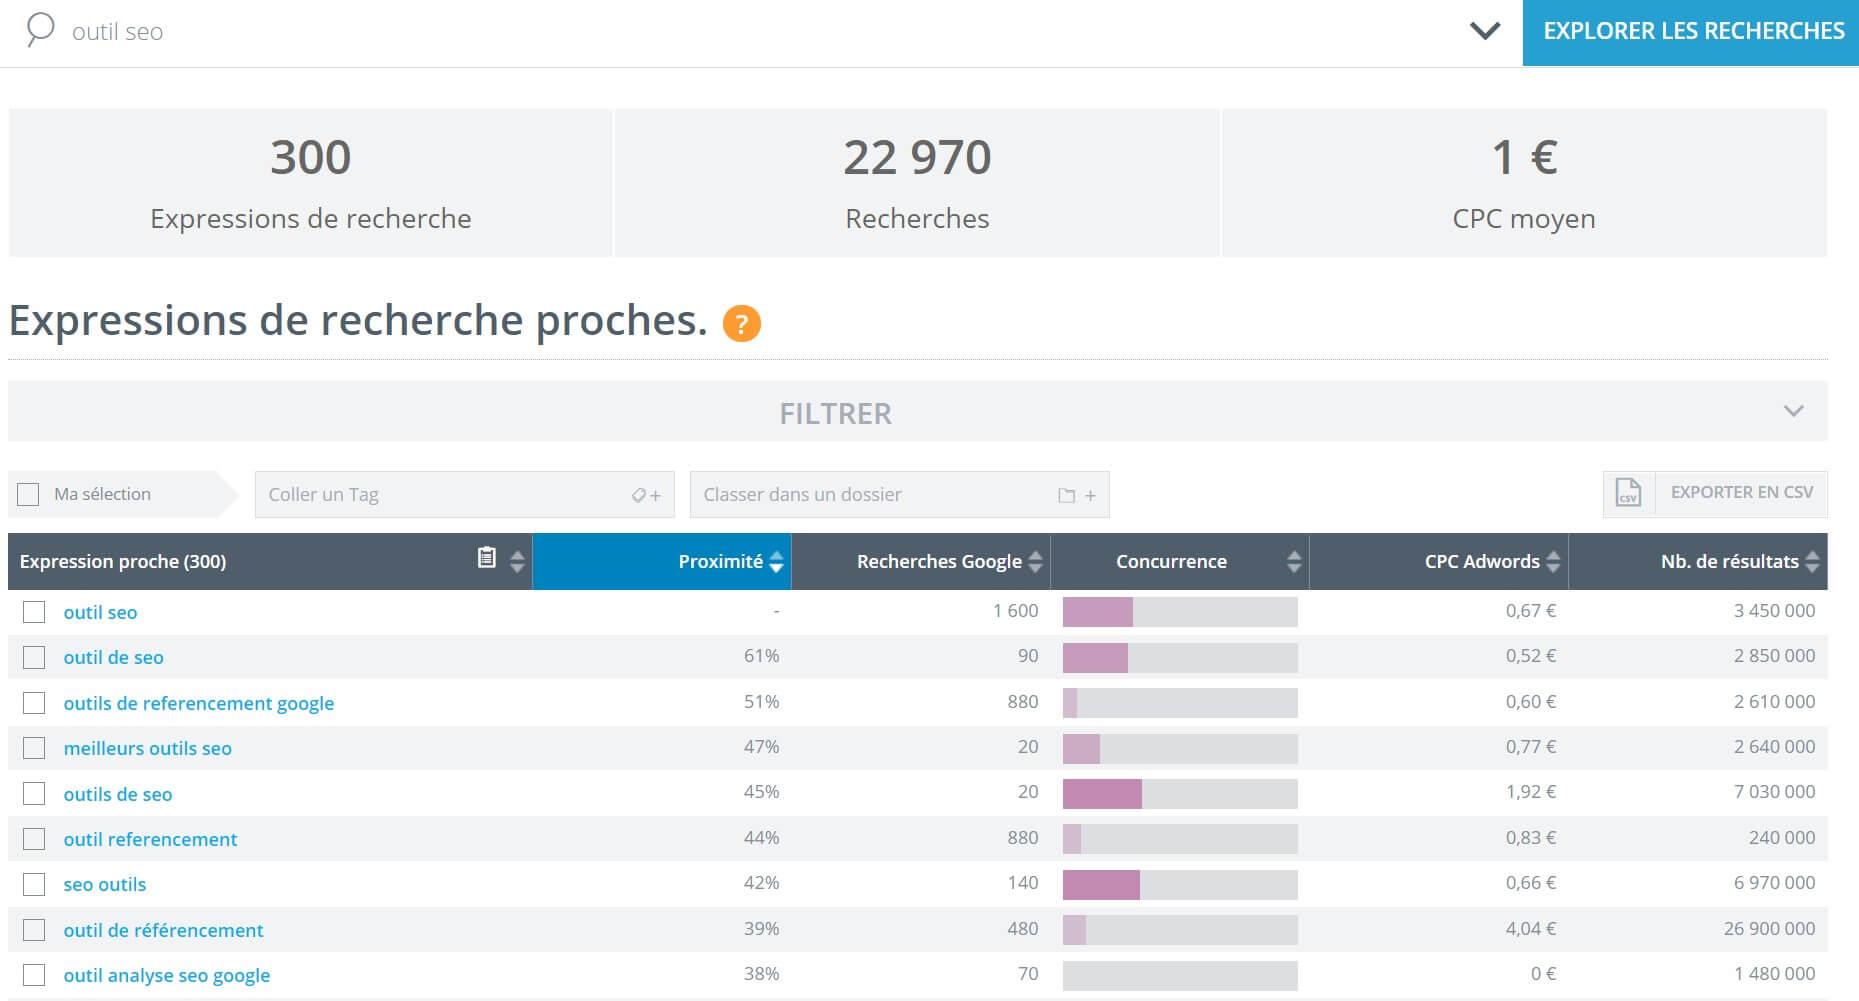 Yooda insight fonctionnalité market explorer